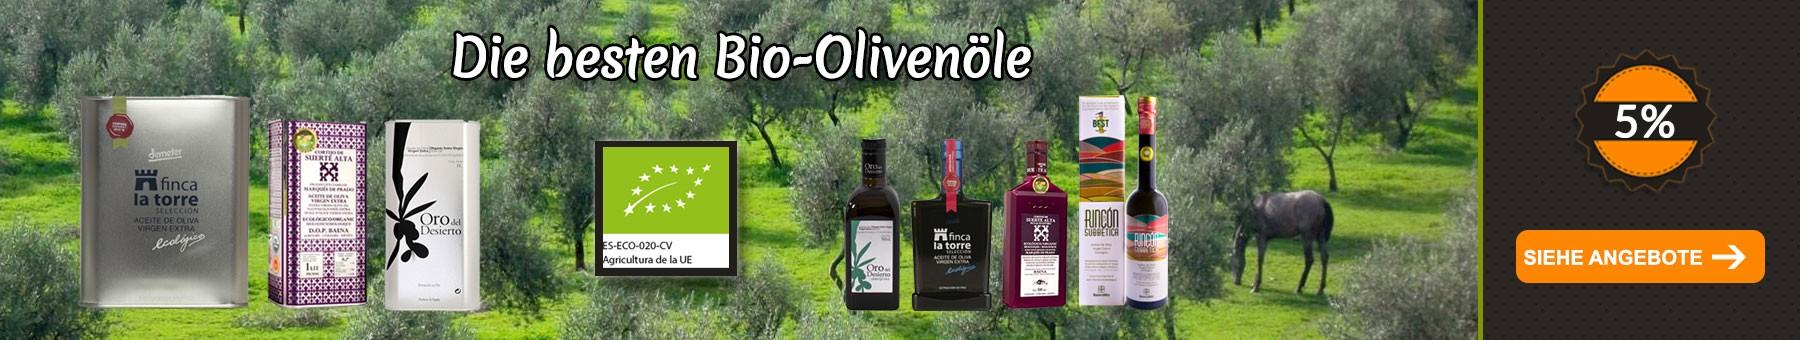 5% Rabatt auf Bio-Olivenöle